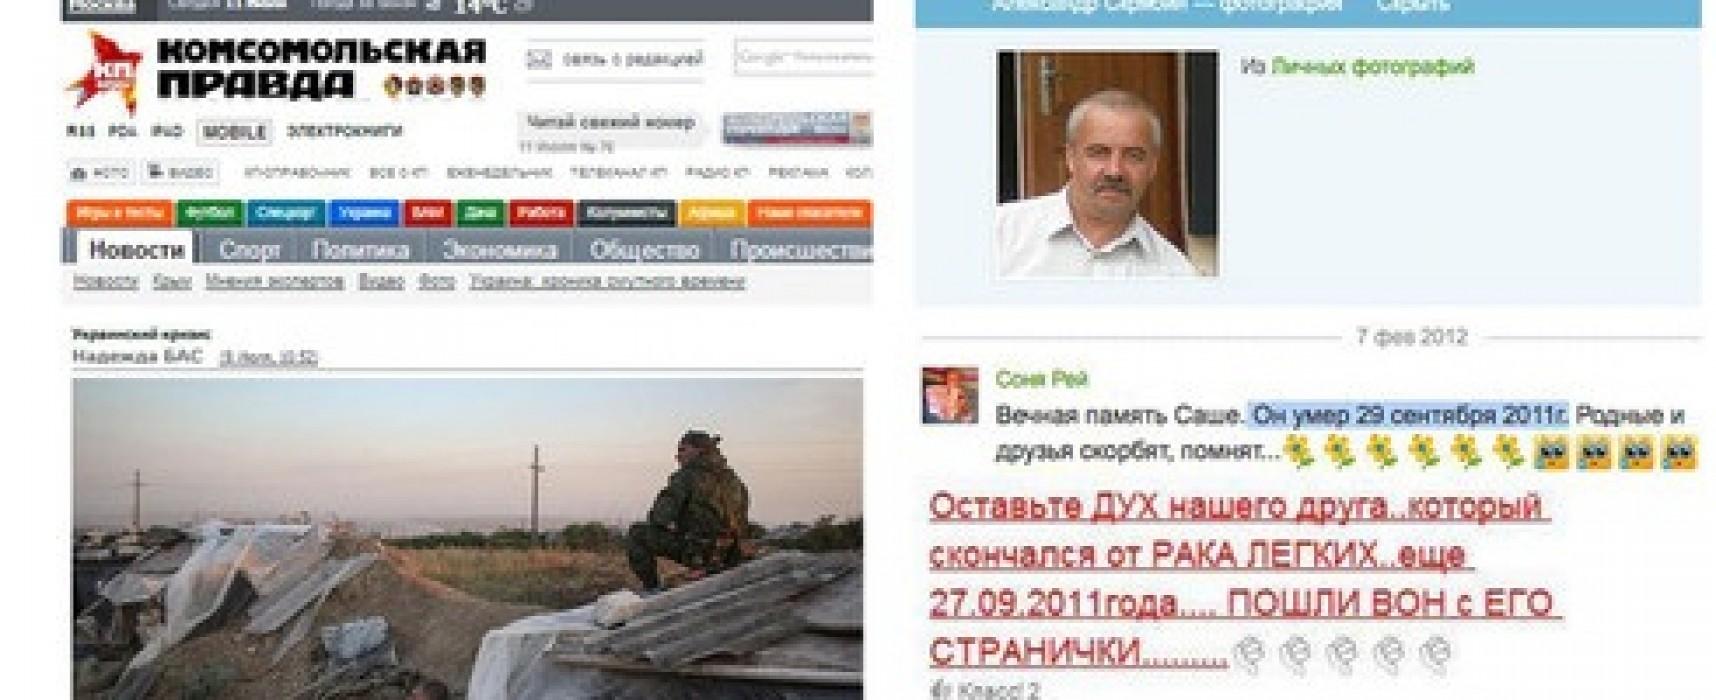 Russia's top lies about Ukraine. Part 4